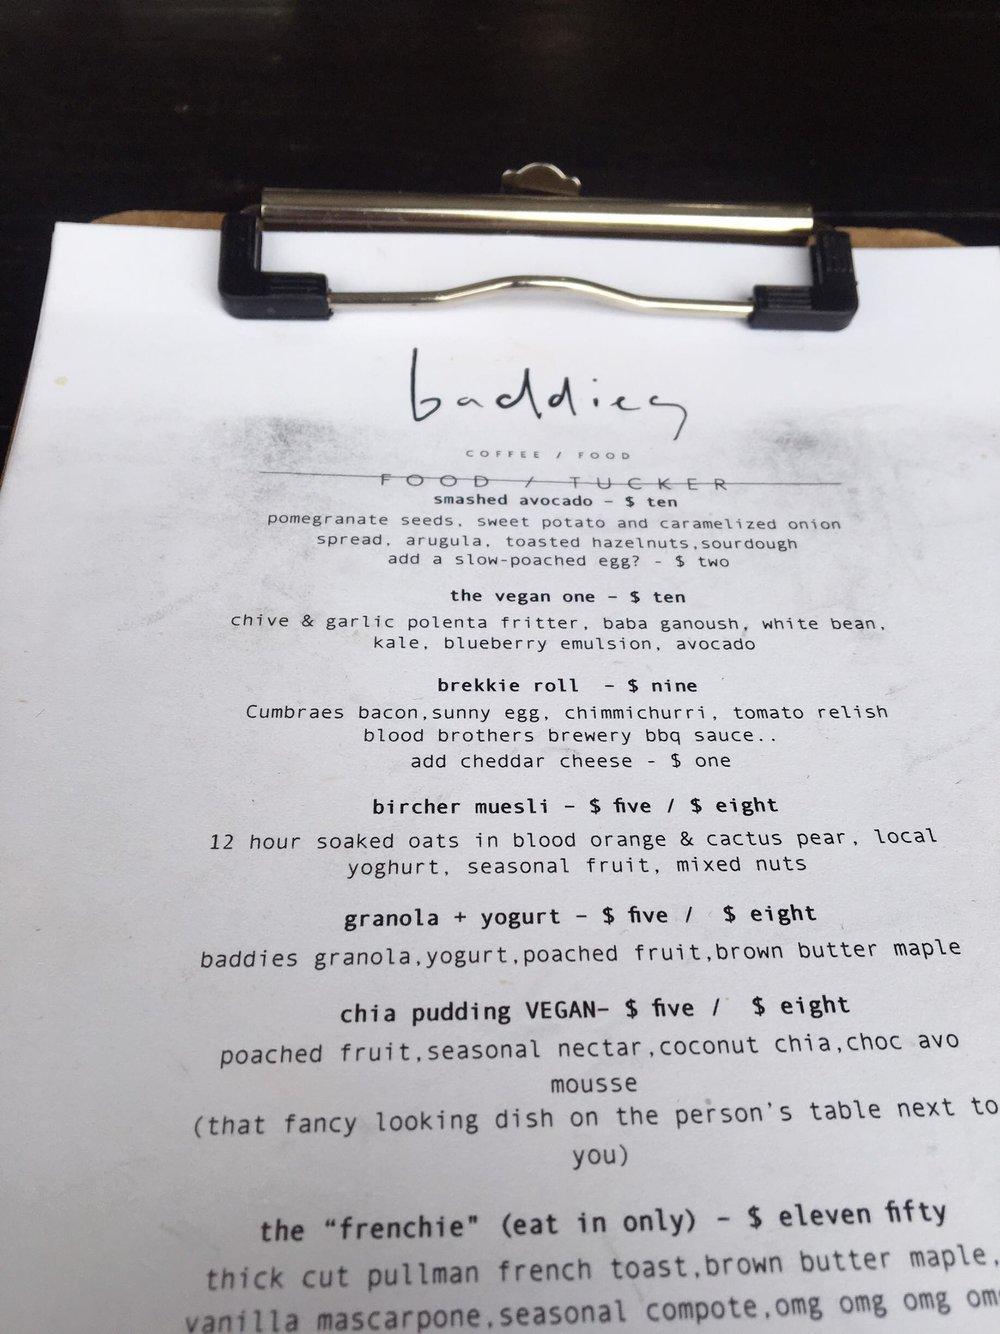 Brunch at Baddies | Baddies Menu | Travel and Lifestyle Blogger | Toronto Ontario